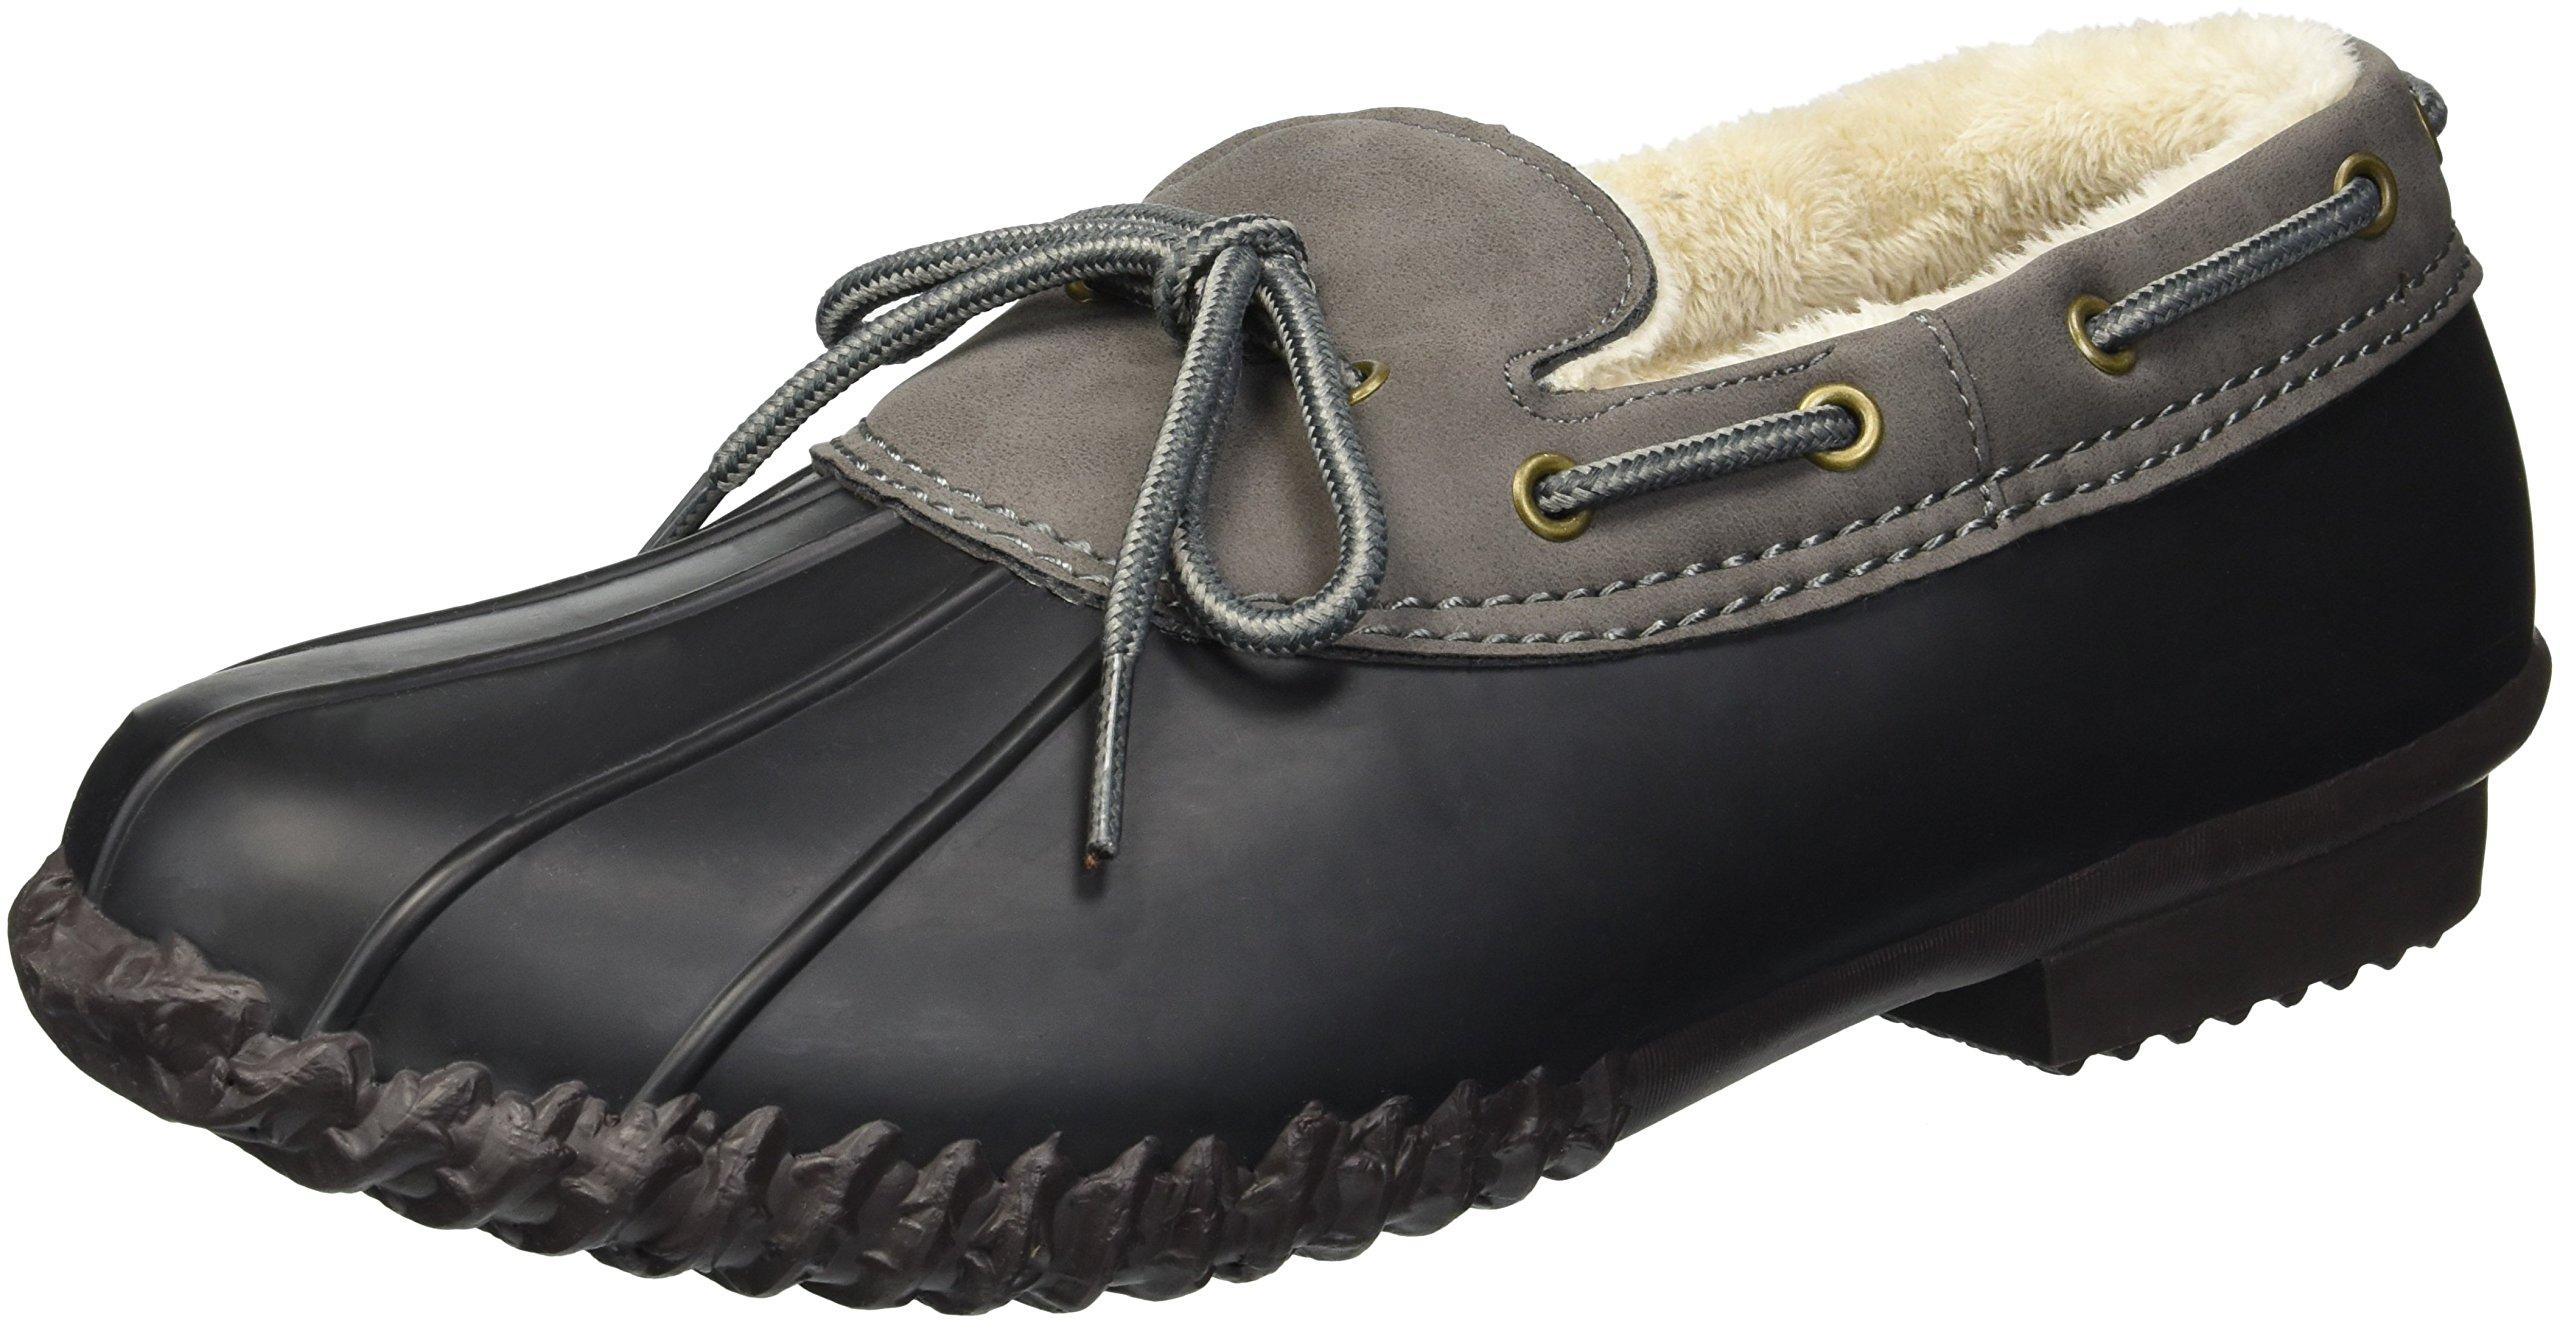 JBU by Jambu Women's Gwen Weather Ready Rain Shoe, Black/Charcoal, 7.5 Medium US